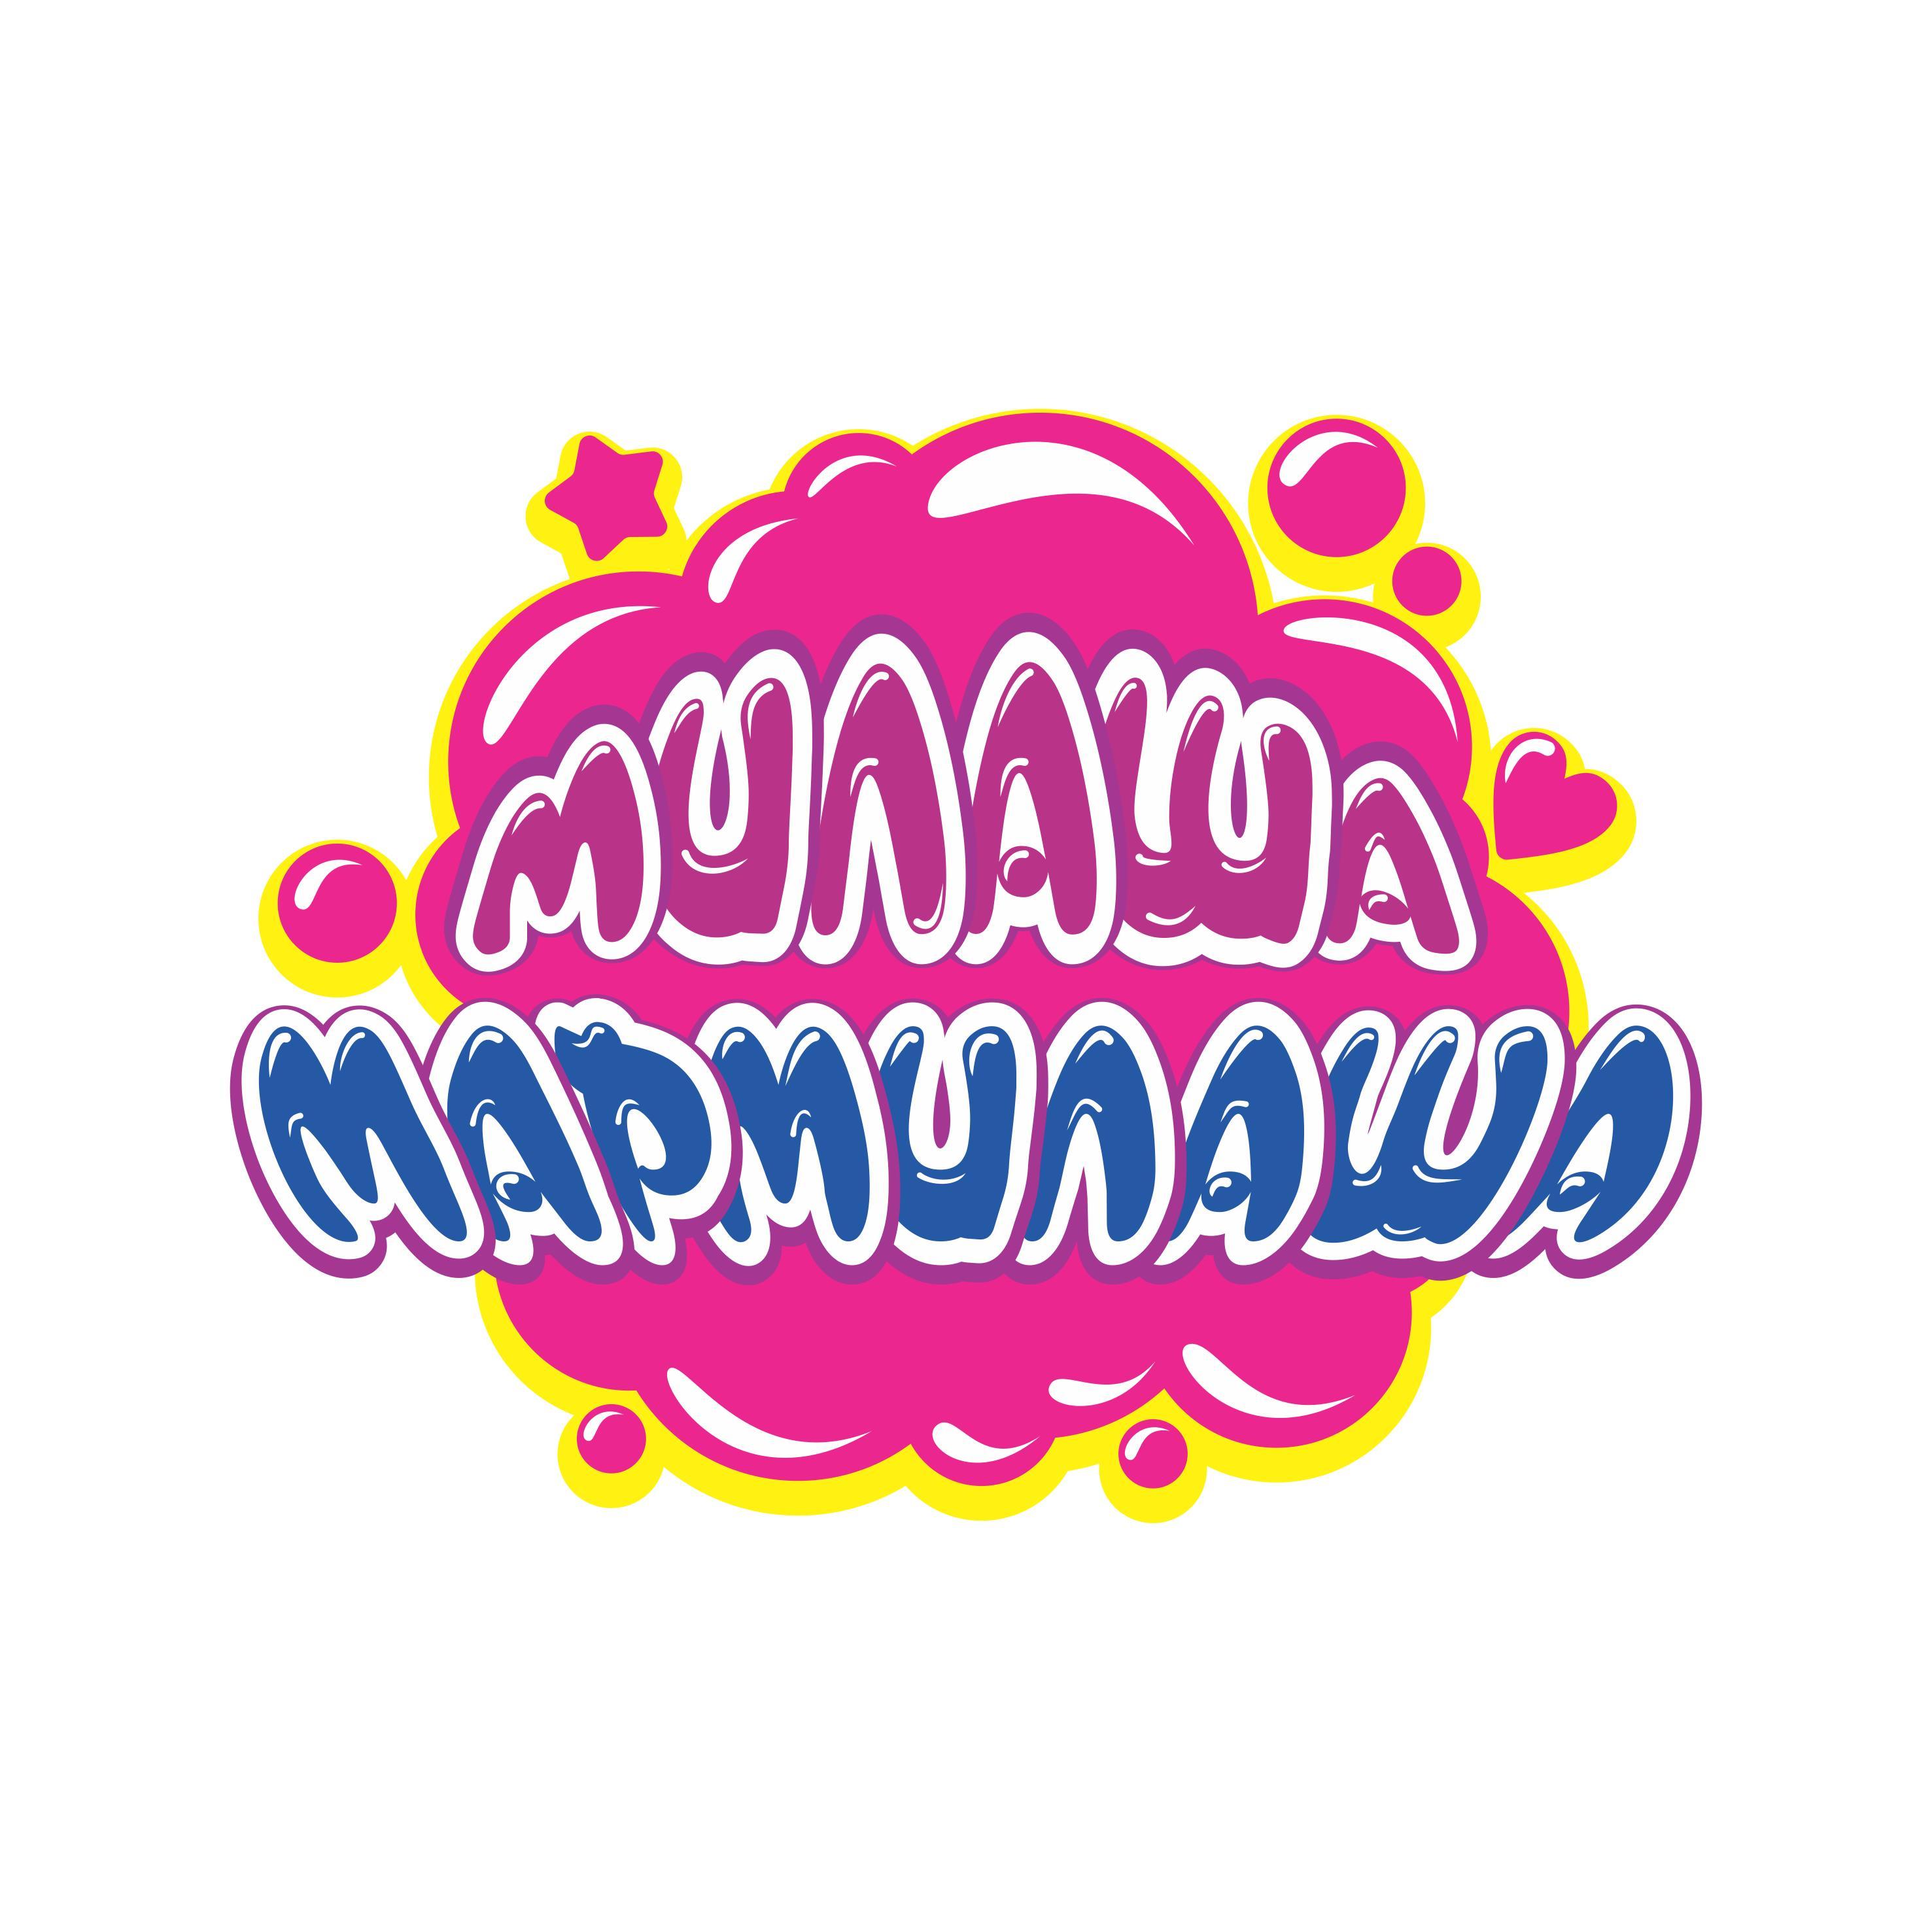 "Логотип для товарного знака ""Милаша-Мармилаша"" фото f_50558769107afe84.jpg"